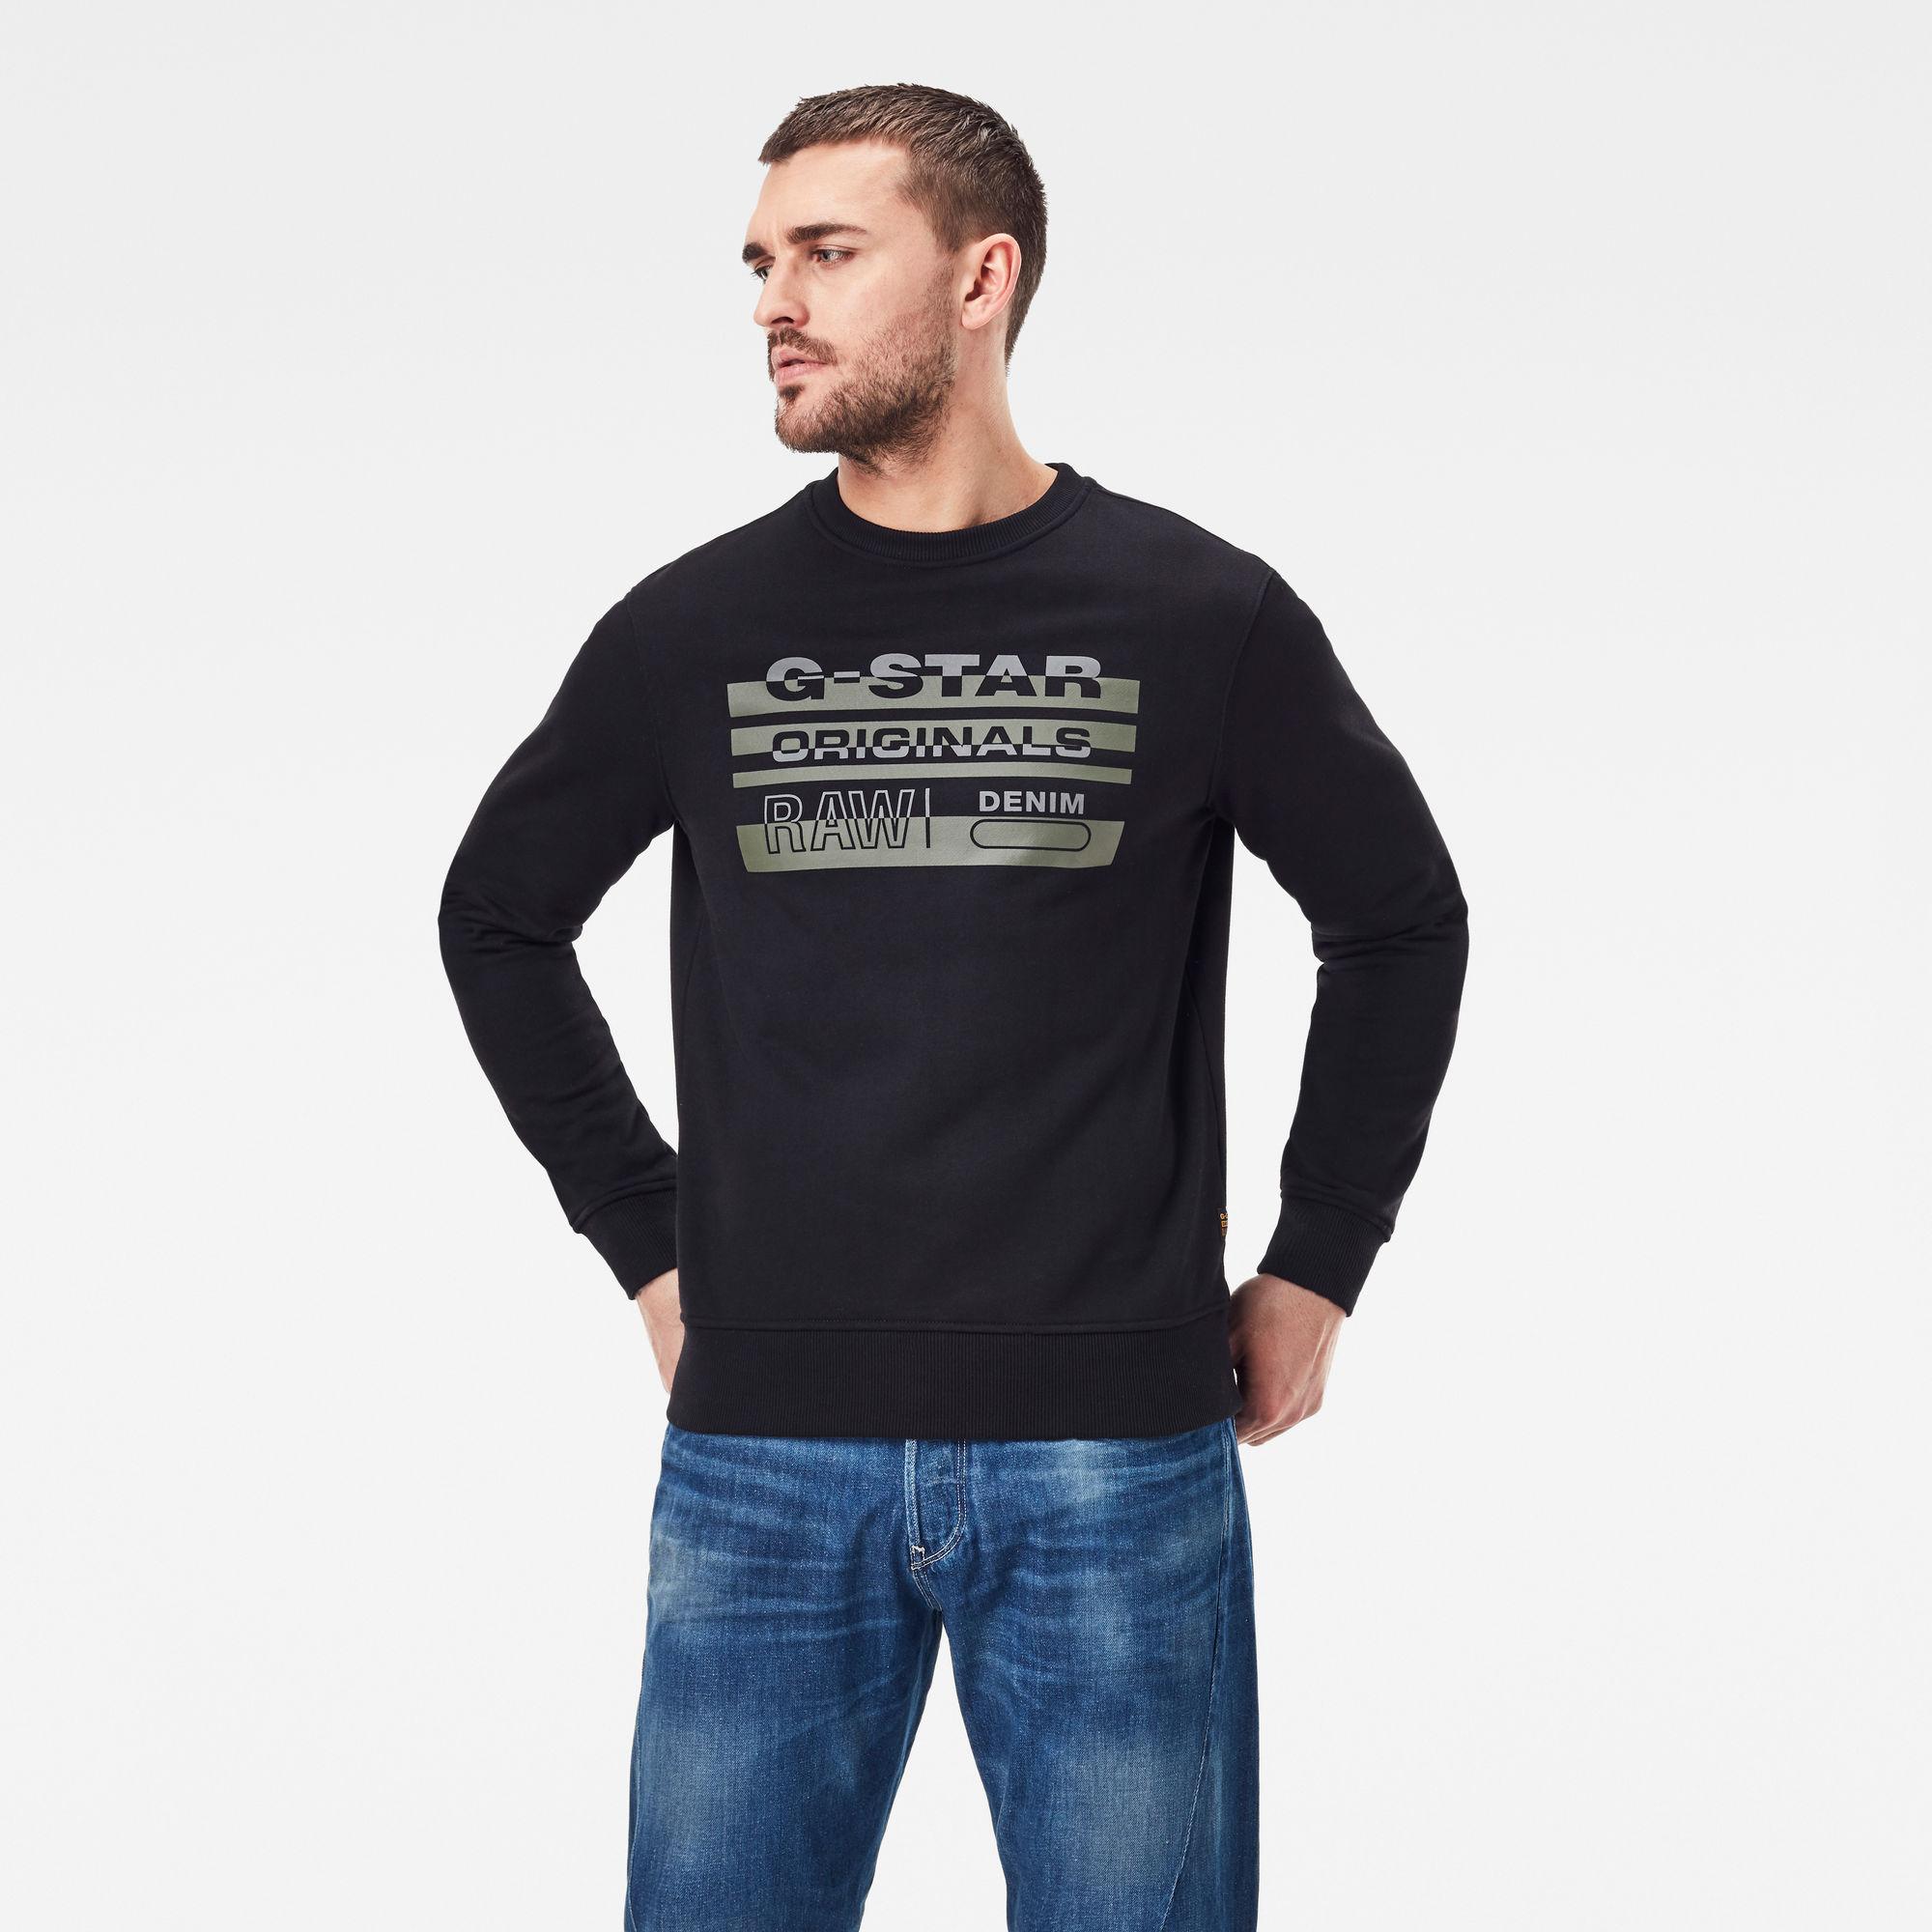 G-Star RAW Heren Originals Sweater Zwart